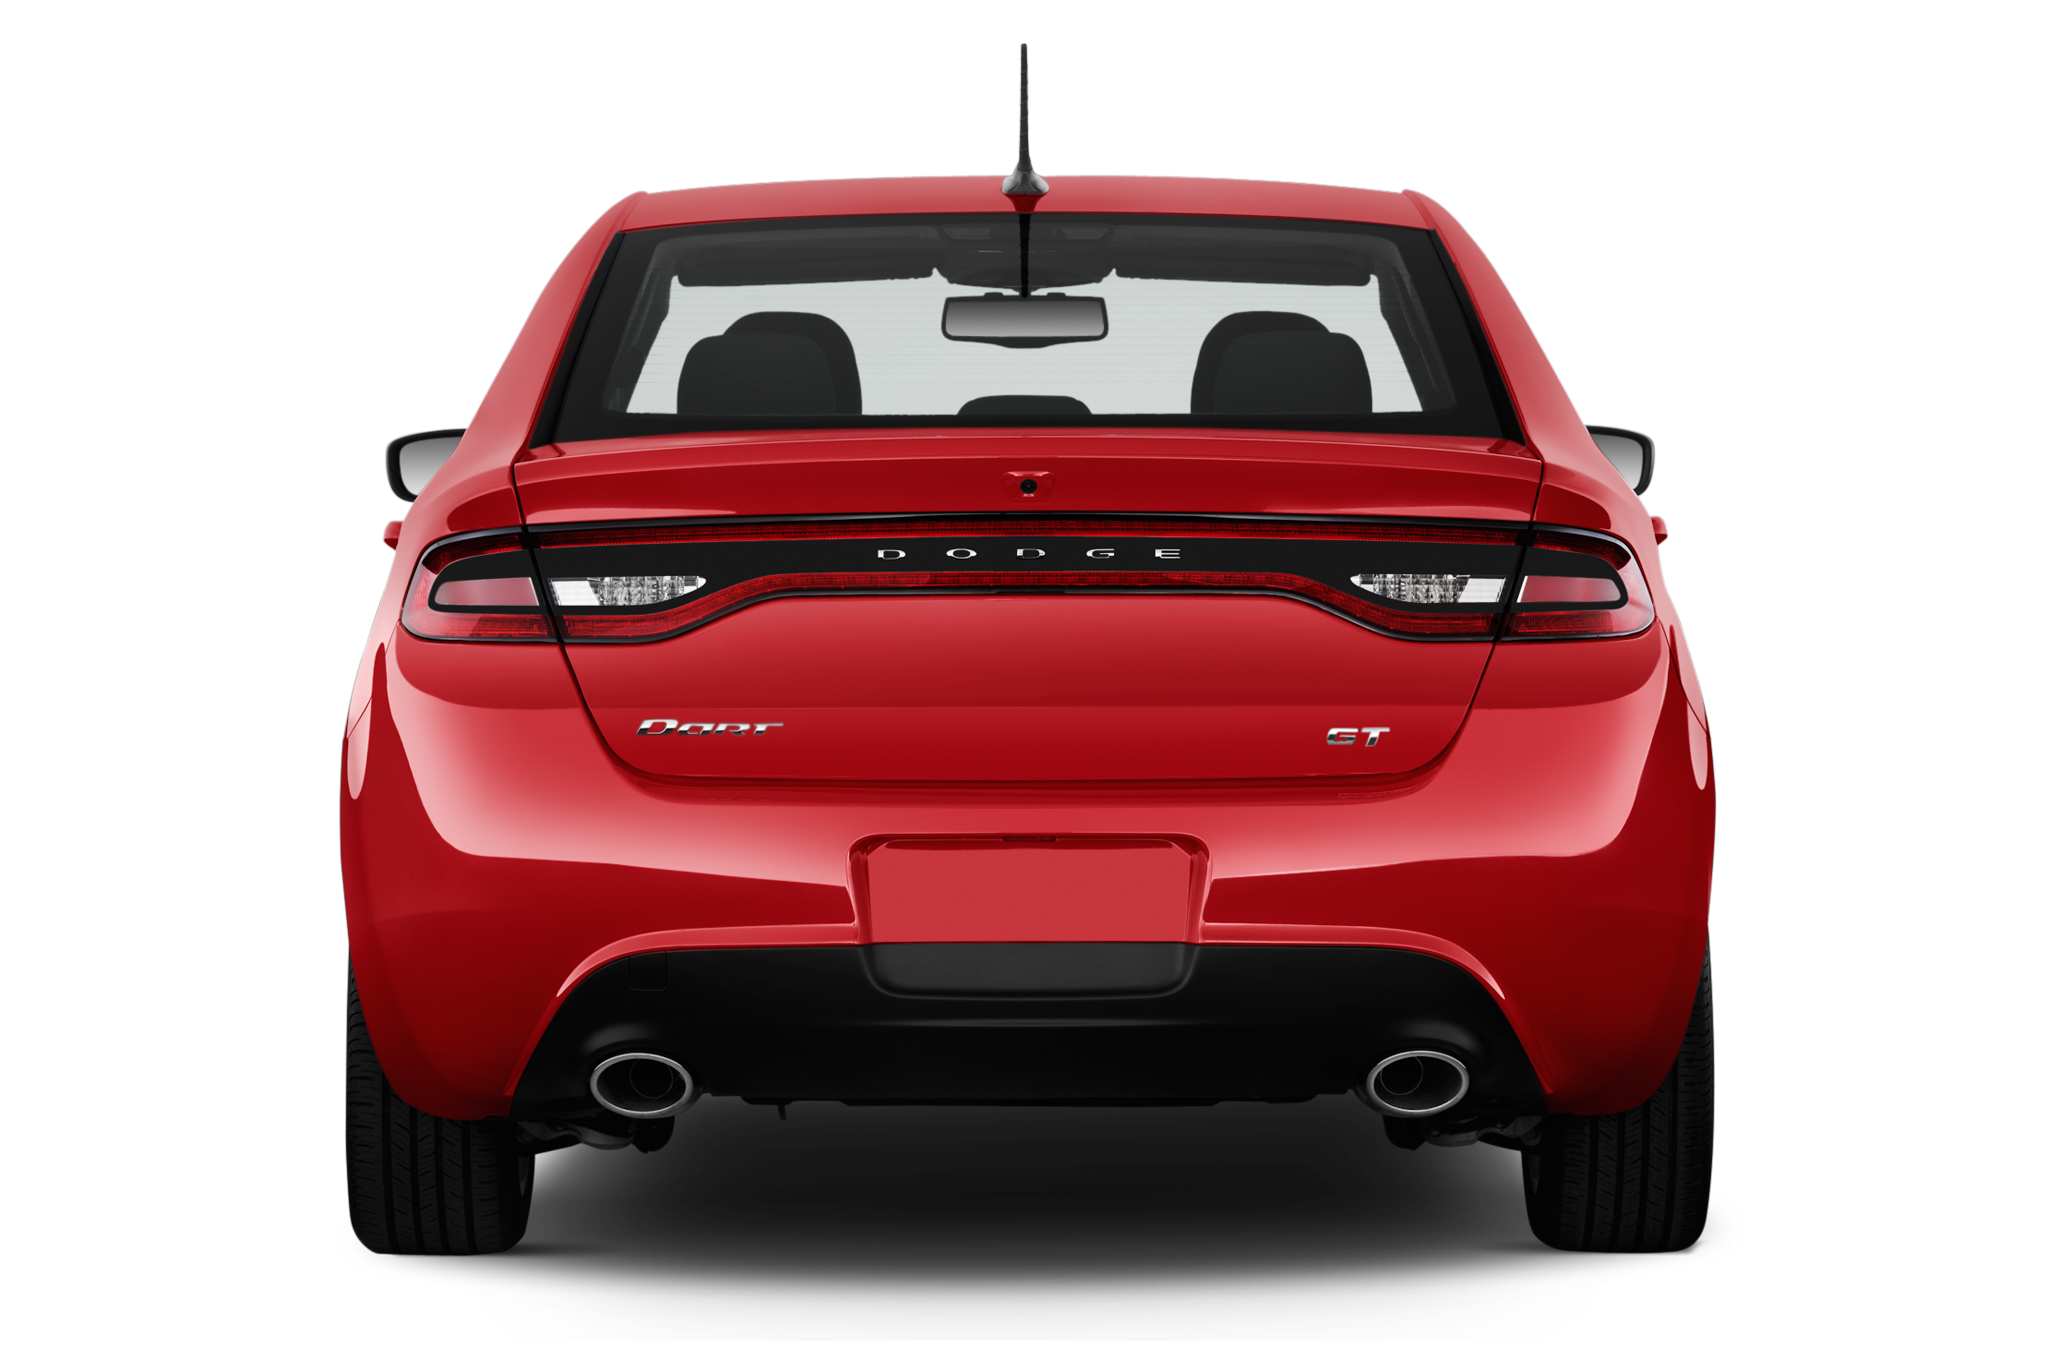 Dodge Aero >> Dodge Dart Lineup Cut to Three Models in Final Sales Year